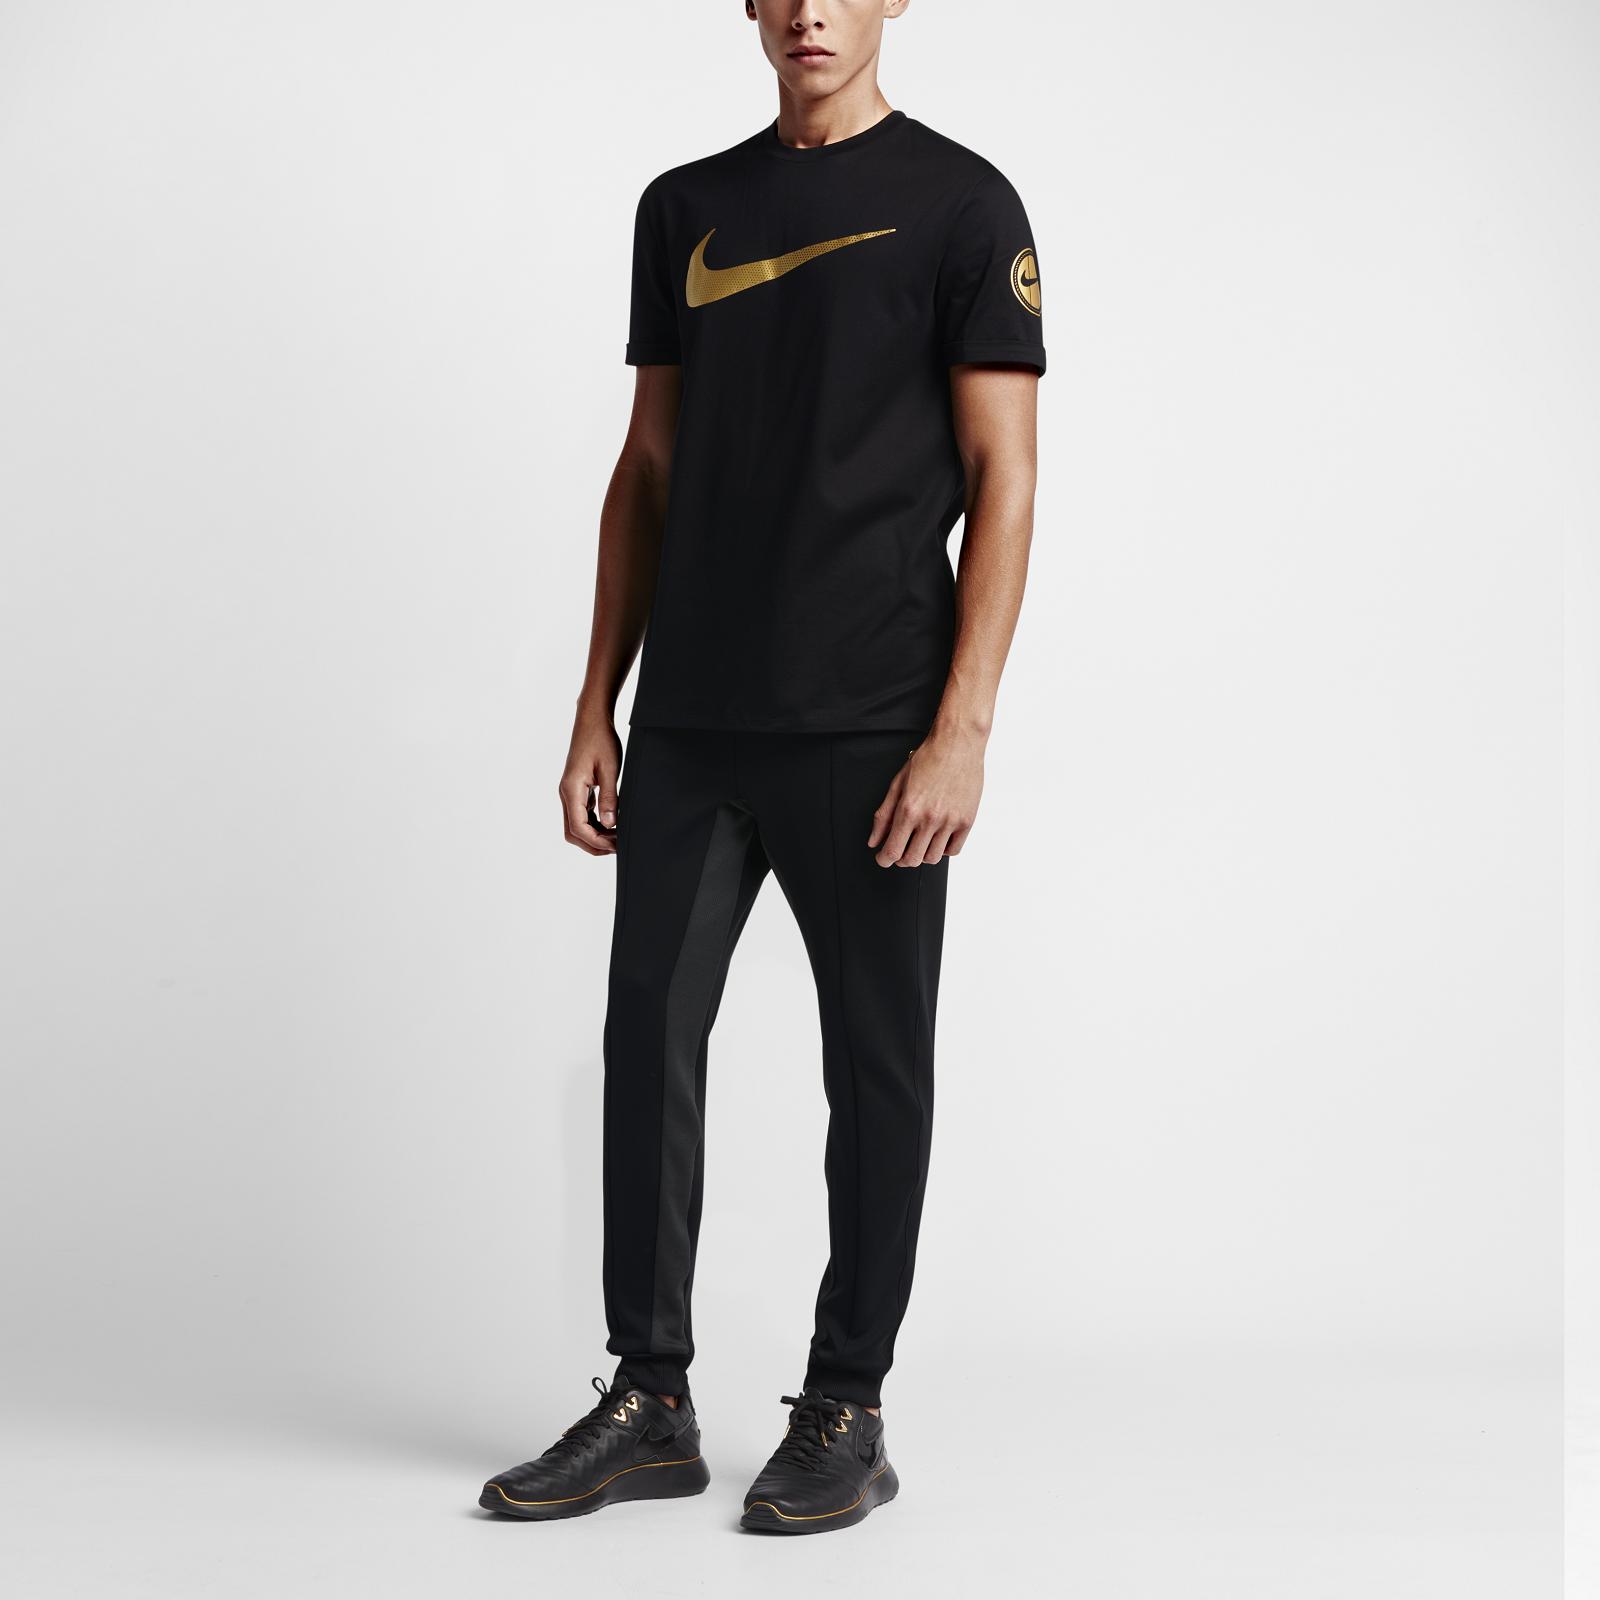 NikeLab_x_OR_6_original